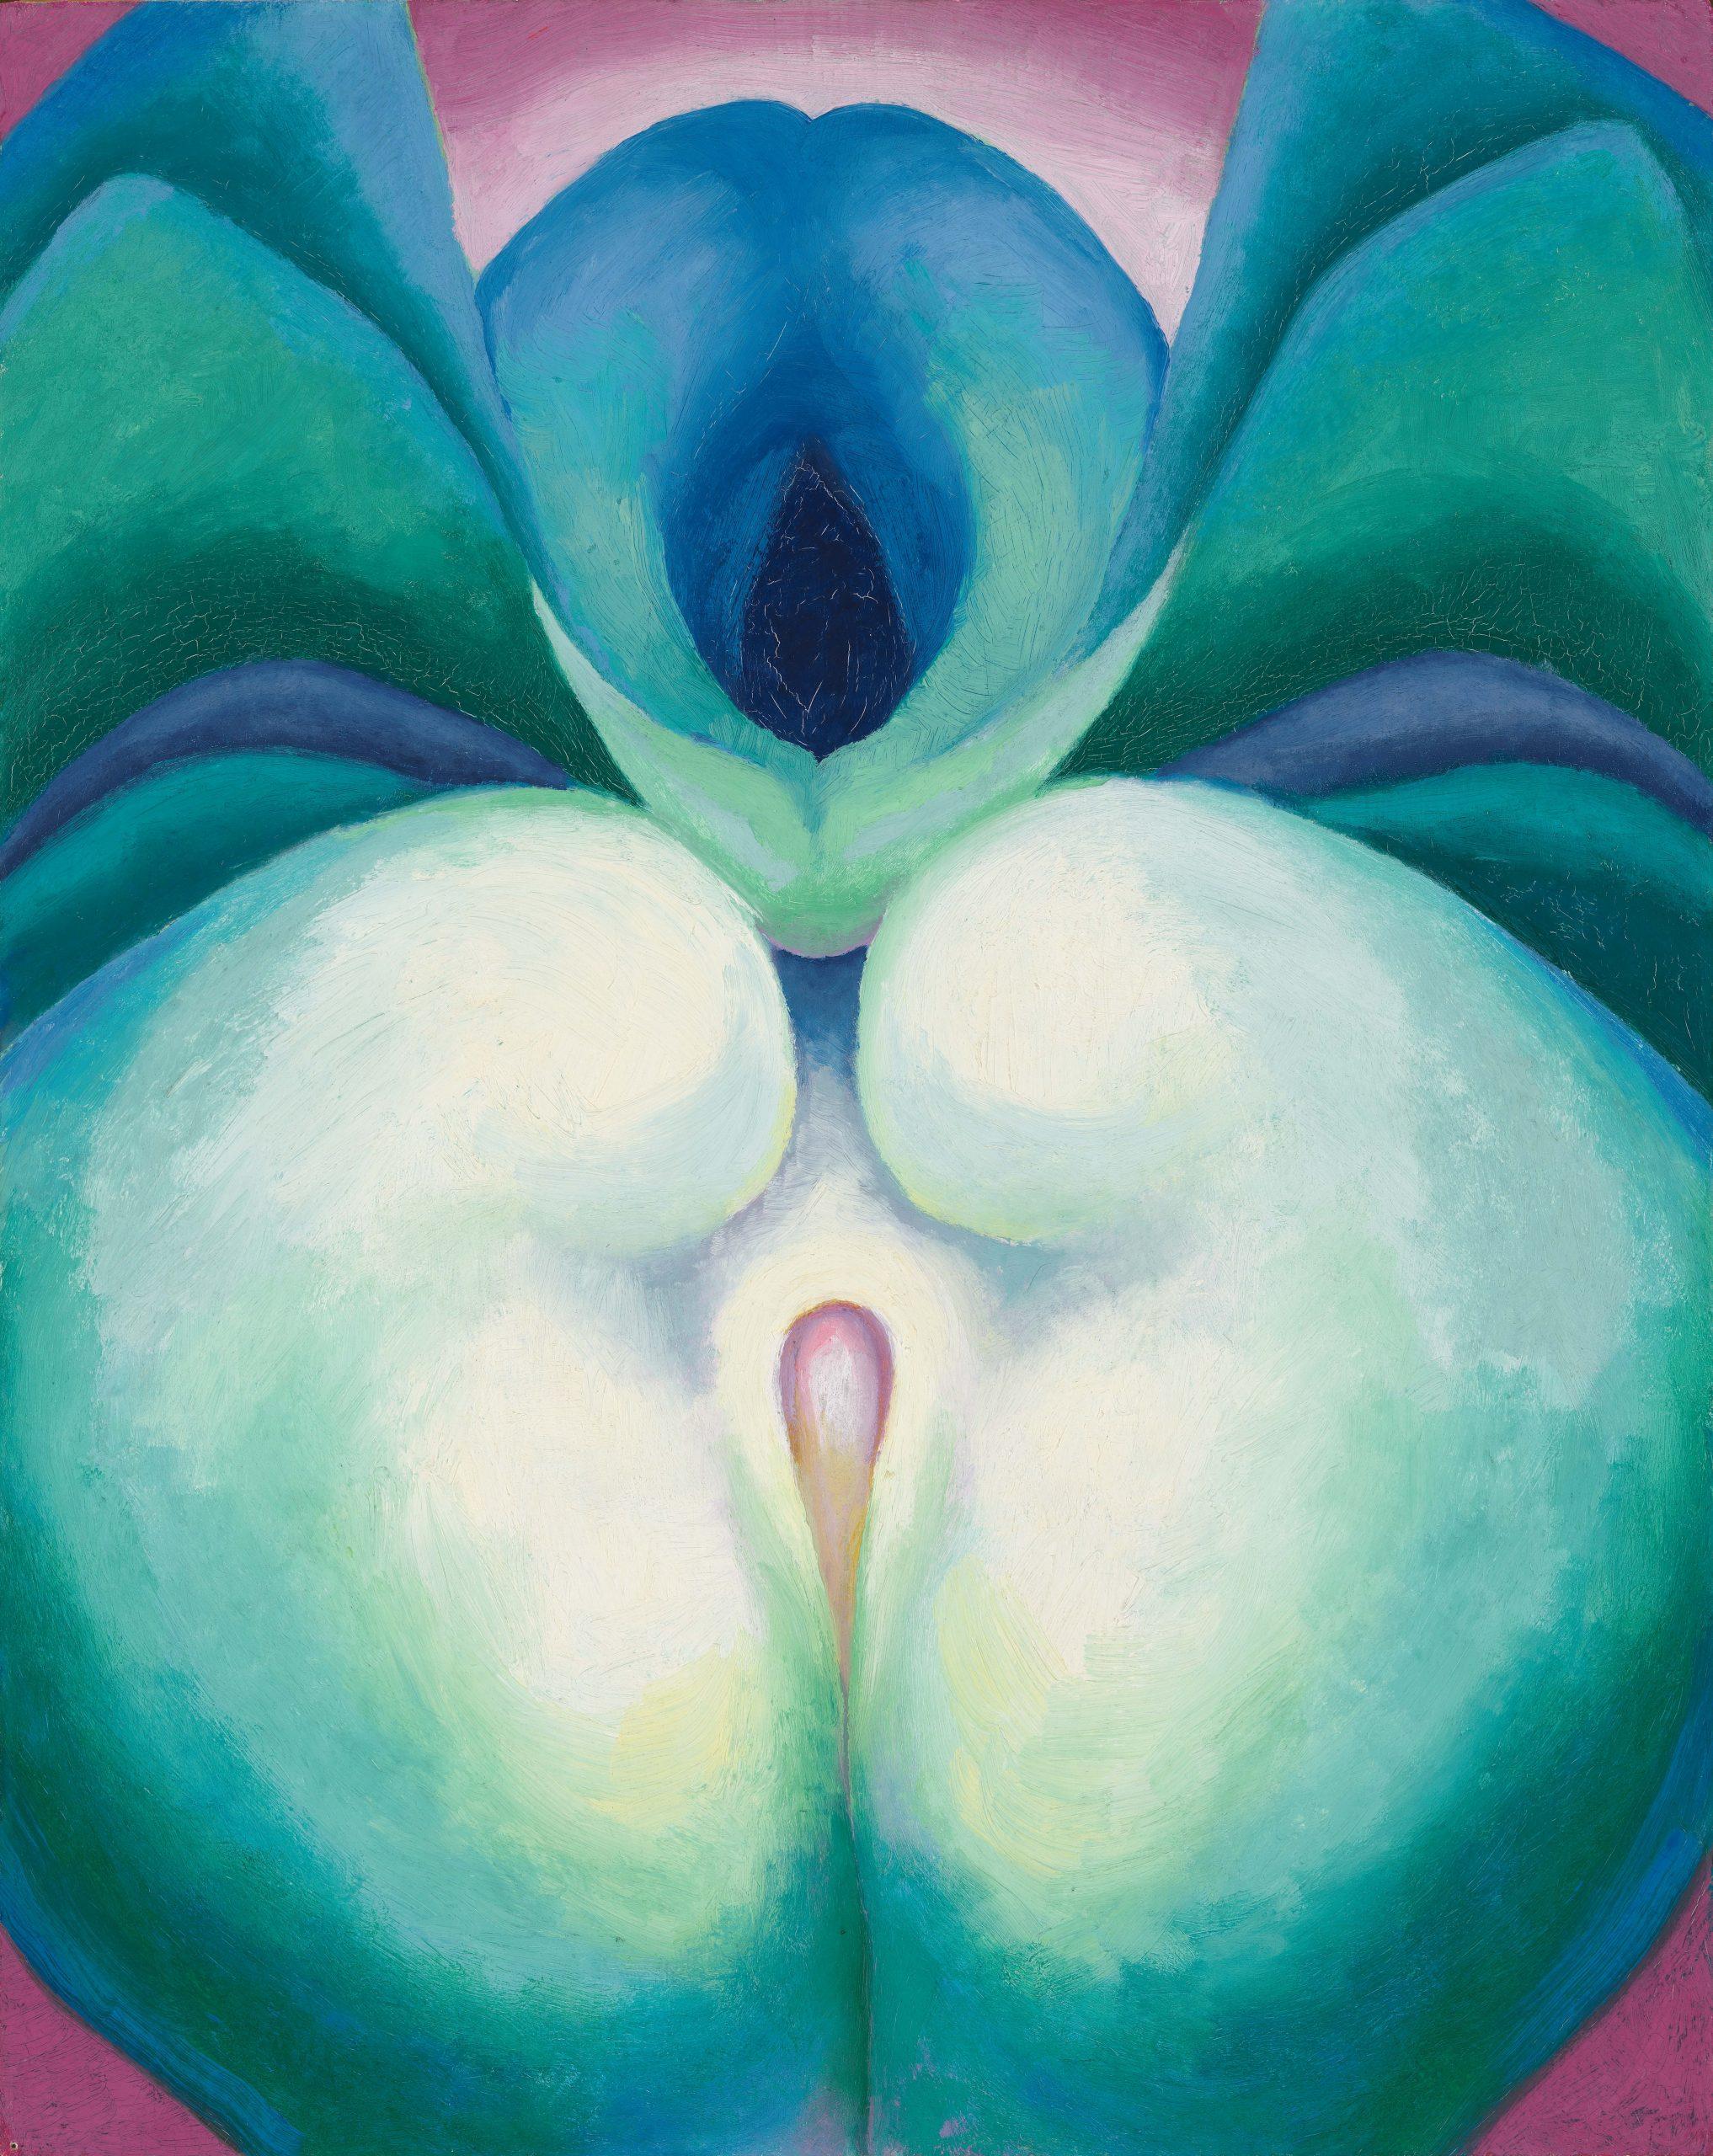 Georgia O'Keeffe Series I White & Blue Flower Shapes, 1919 Huile sur panneau, 50,5 × 40 cm Georgia O'Keeffe Museum, Santa Fe.  Gift of The Georgia O'Keeffe Foundation Courtesy Georgia O'Keeffe Museum. Photography: Tim Nighswander/Imaging4Art © Georgia O'Keeffe Museum / Adagp, Paris, 2021